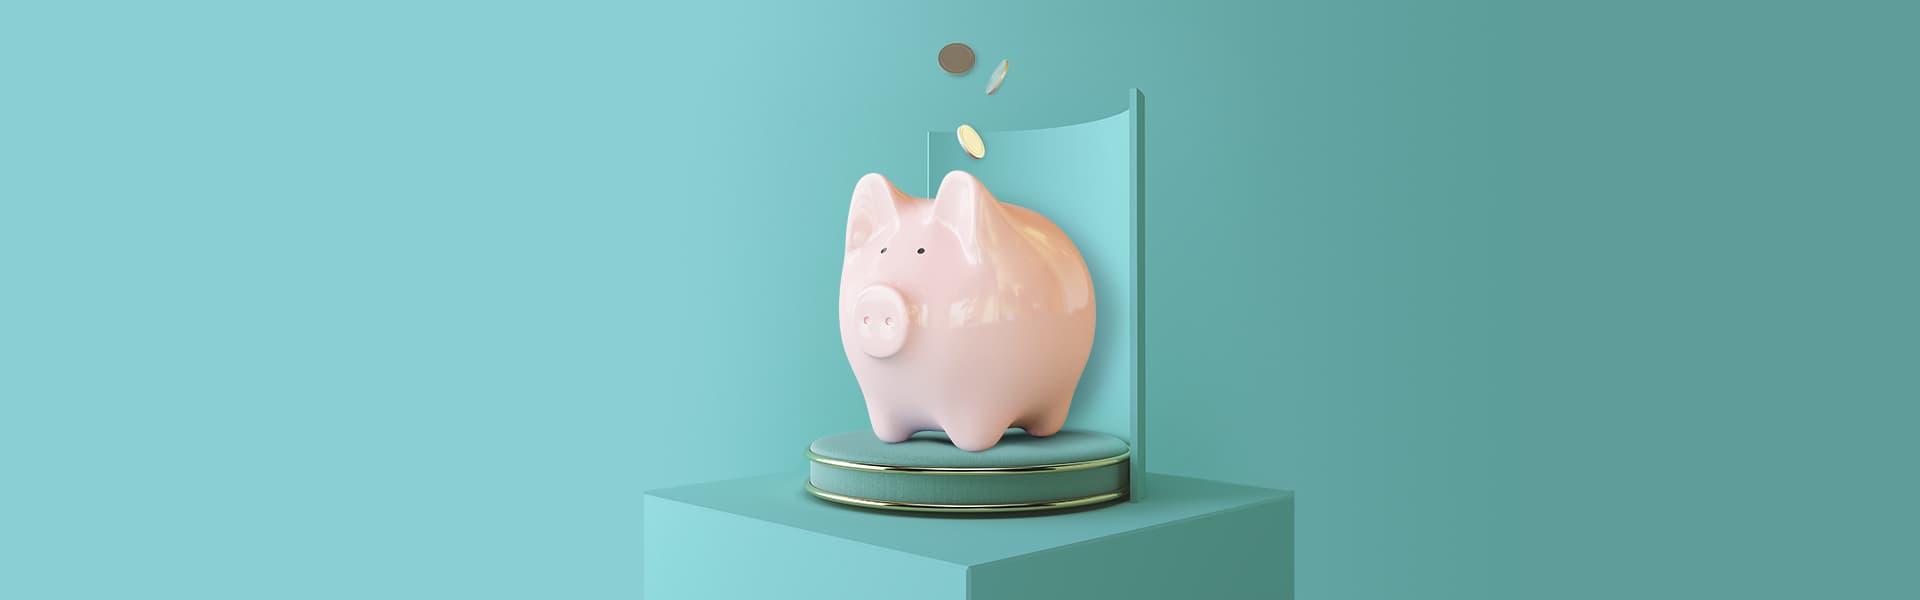 Aktuelle Cashback-Aktionen